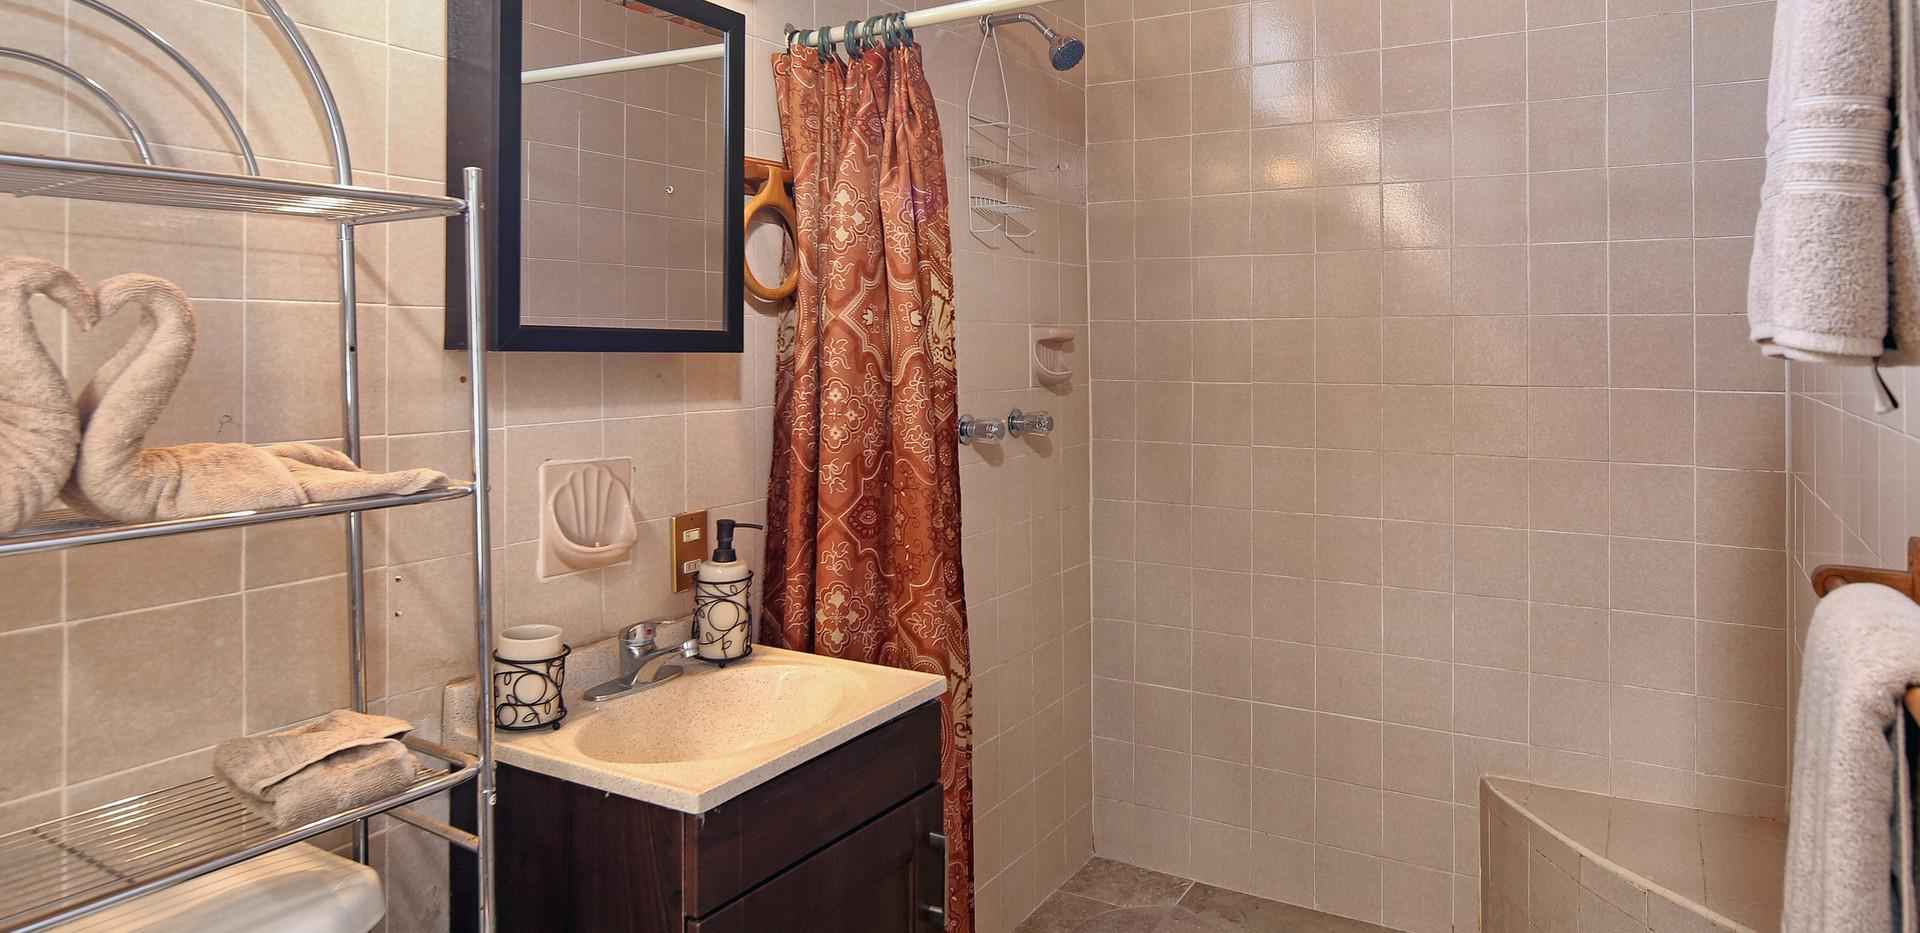 sonrisas bathroom.jpg